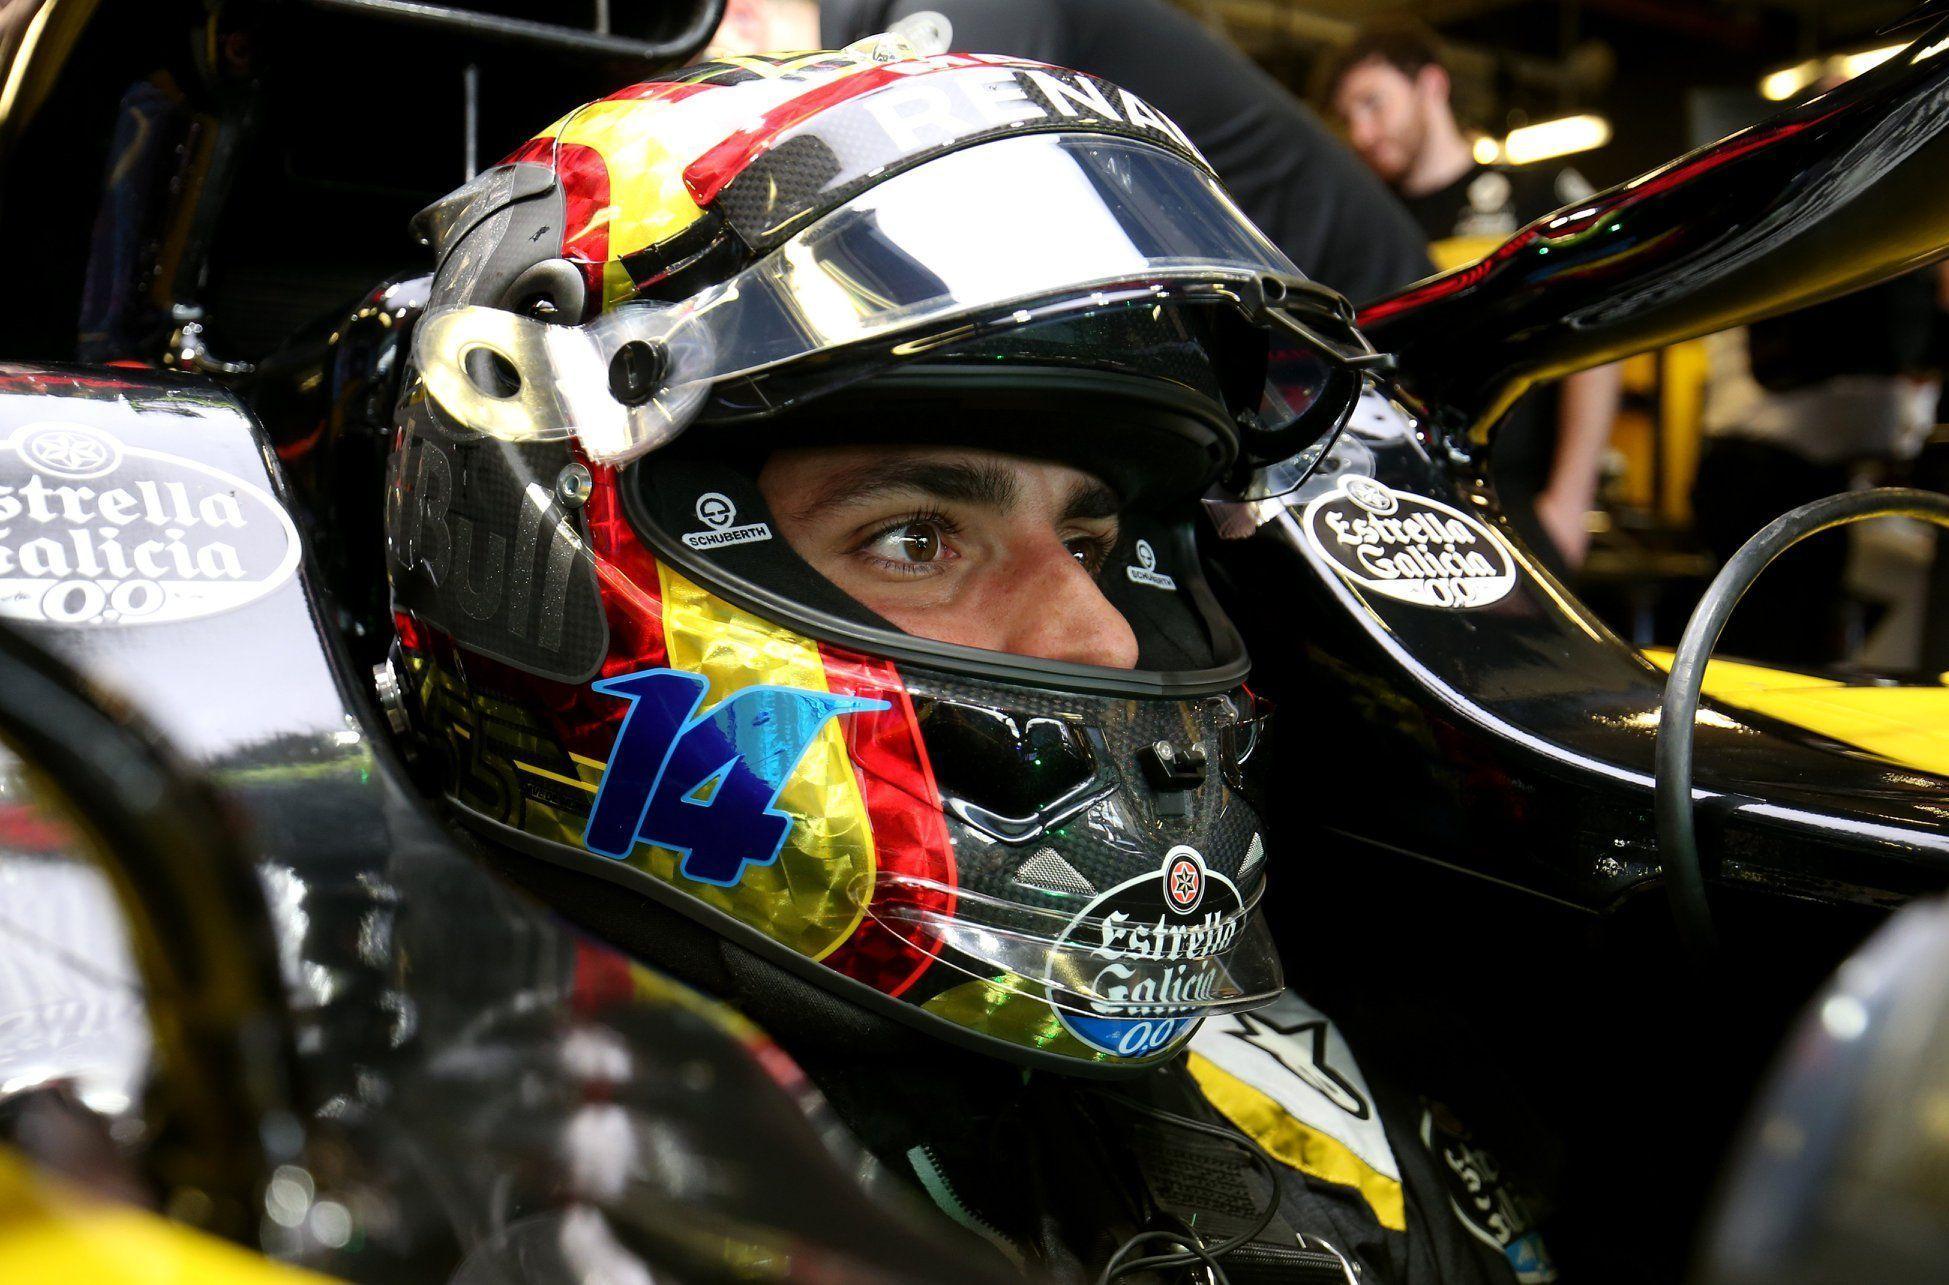 Carlos Sainz, Estrella Galicia 0,0, McLaren